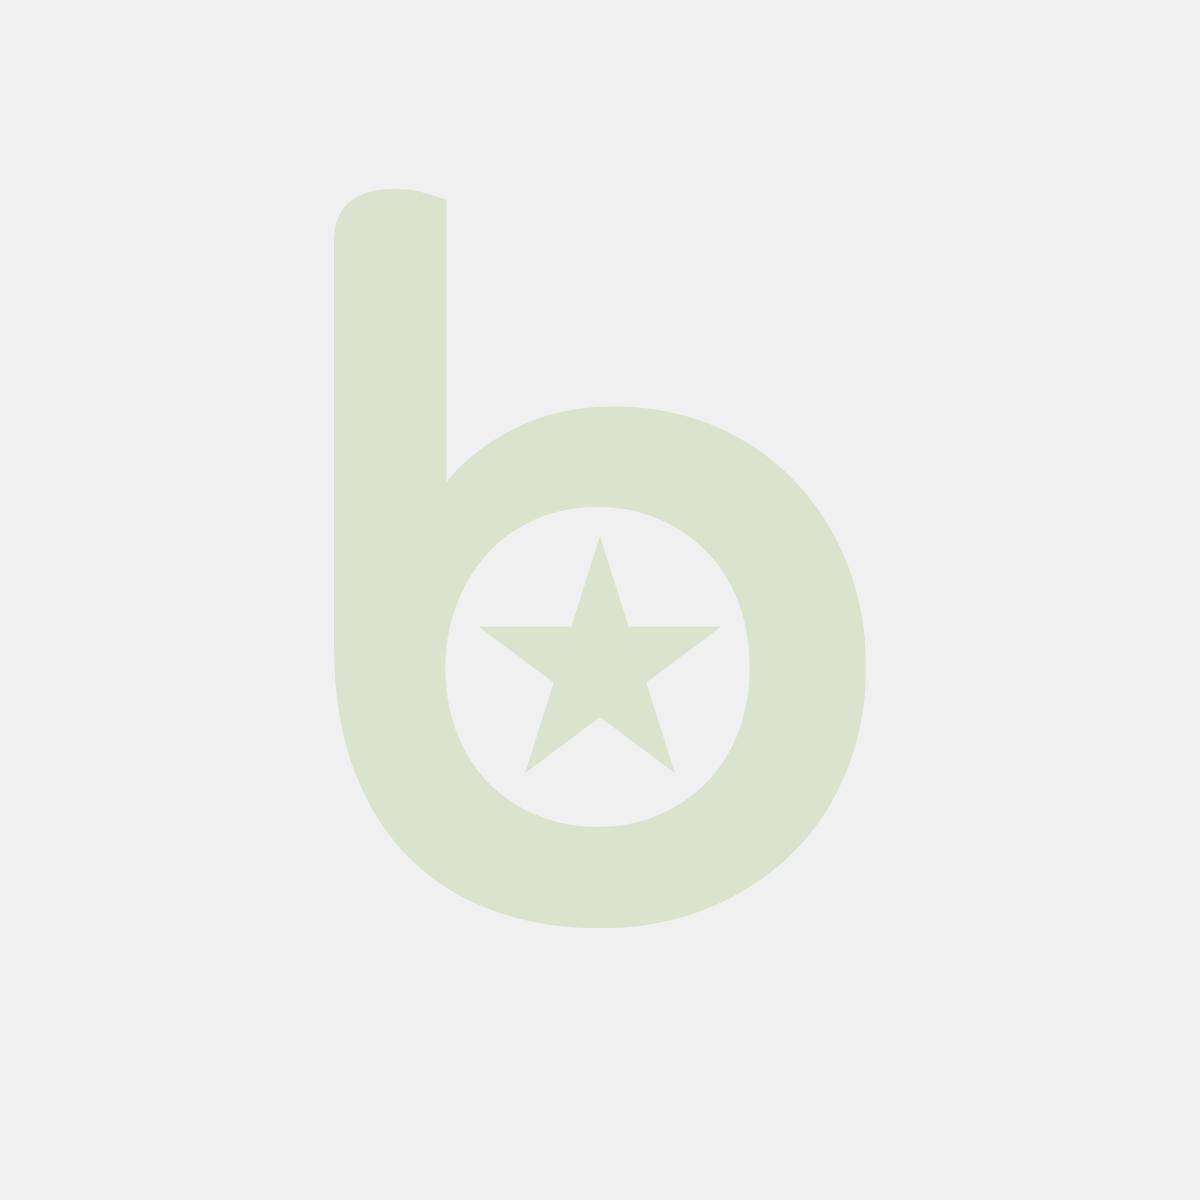 Bloczek samoprzylepny POST-IT® Super Sticky (654S-N), 76x76mm, 5x90 kartek, neonowe